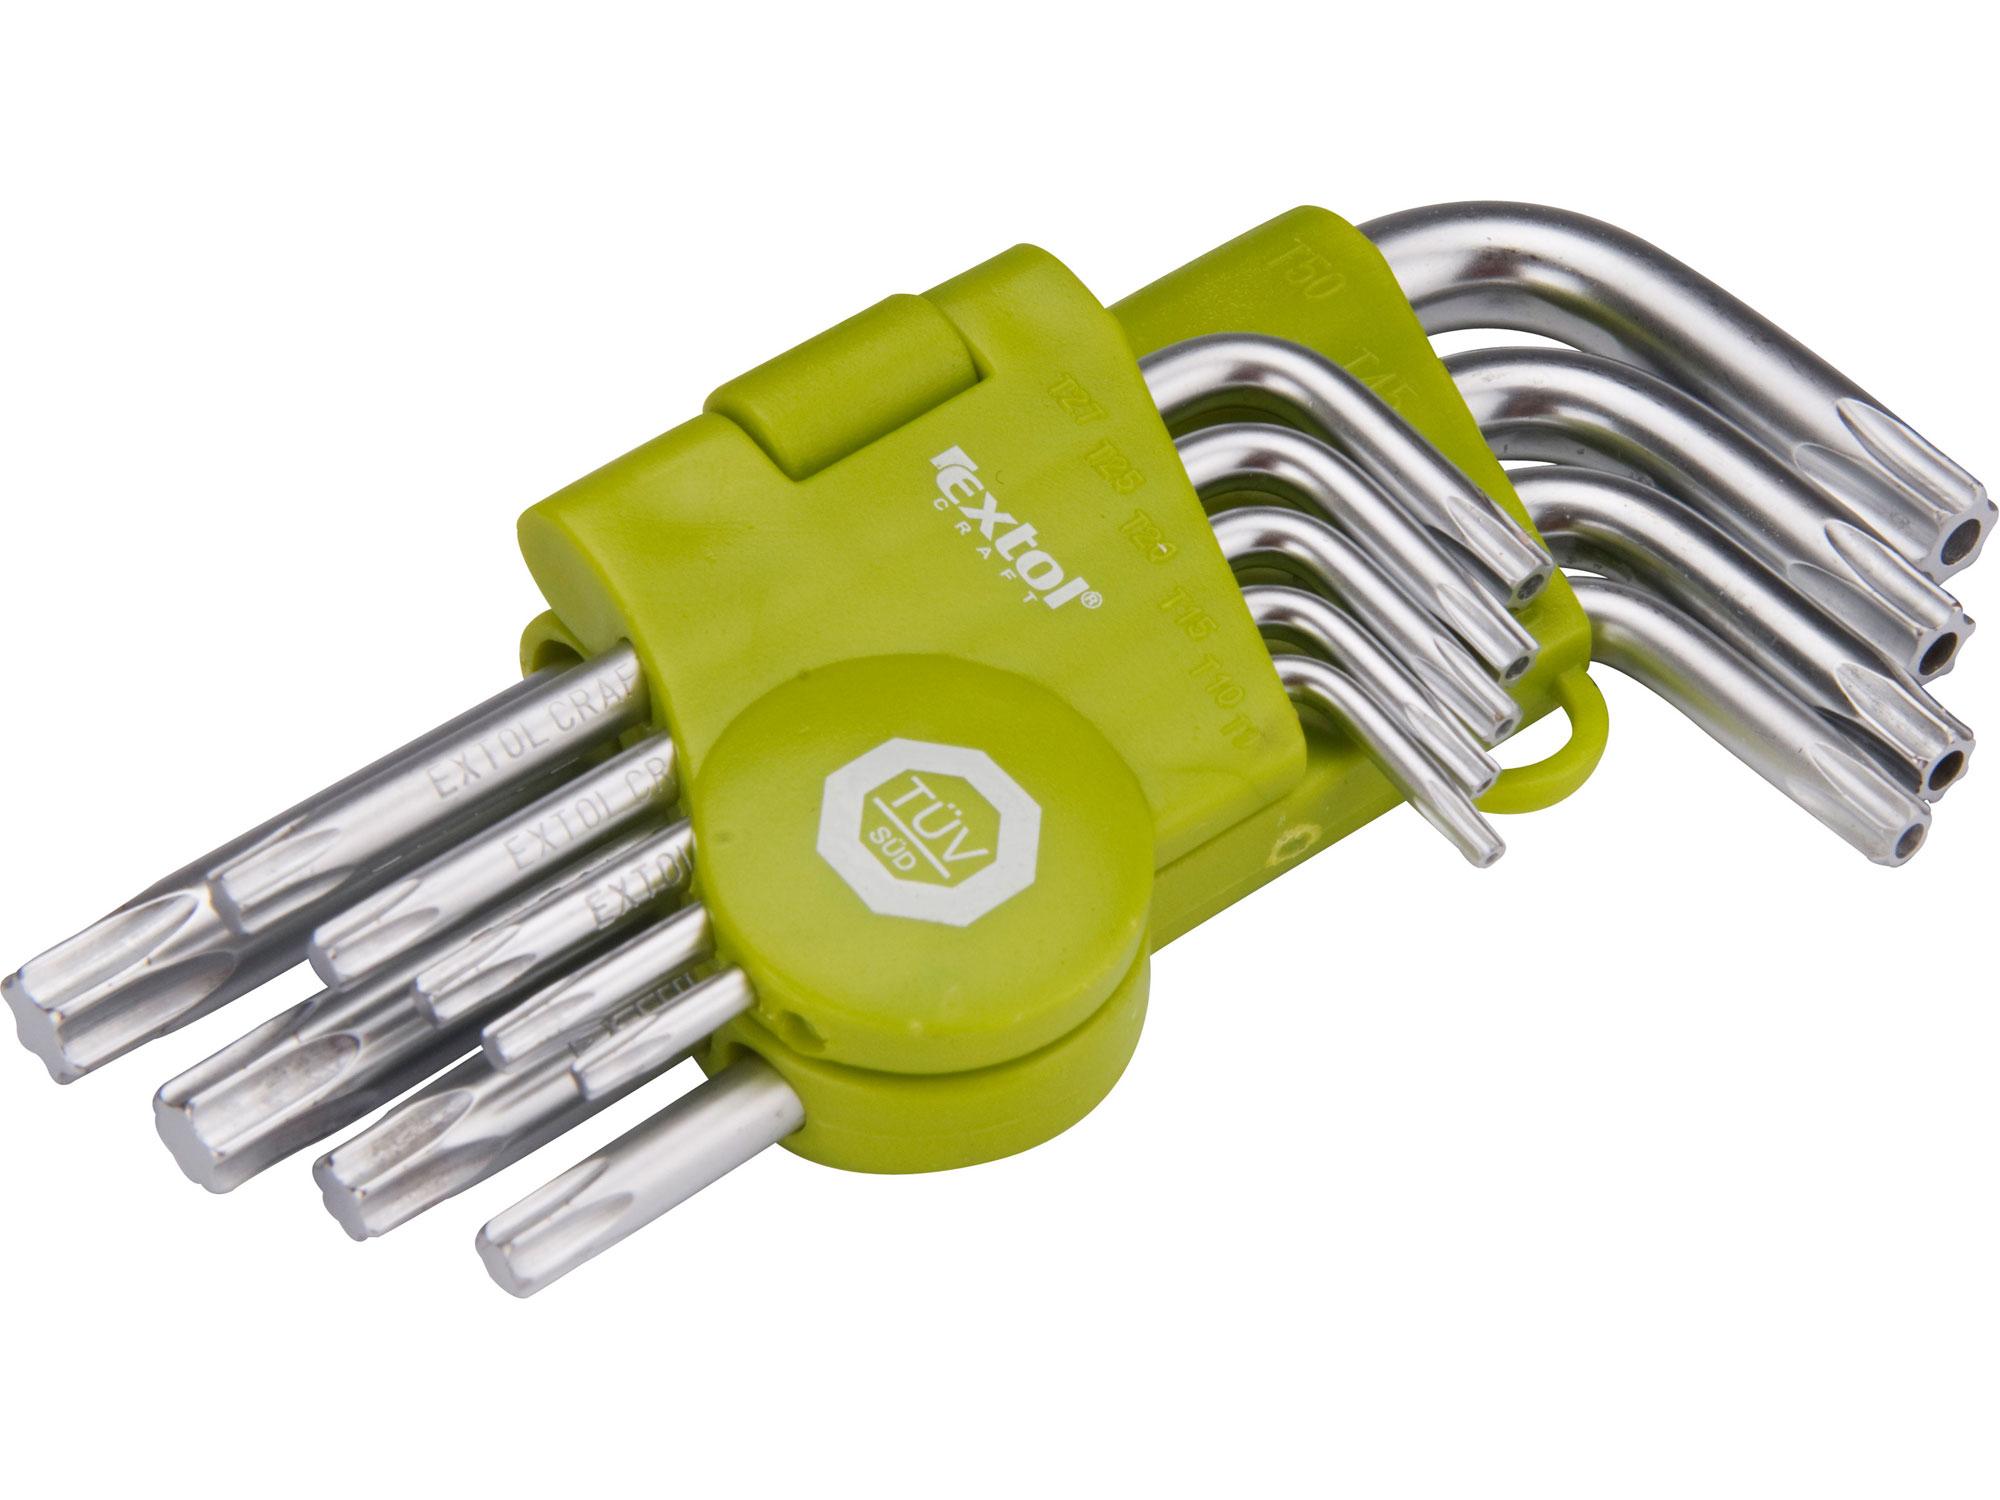 L-klíče TORX, sada 9ks, T 10-50mm, krátké, vrtané EXTOL CRAFT 66010